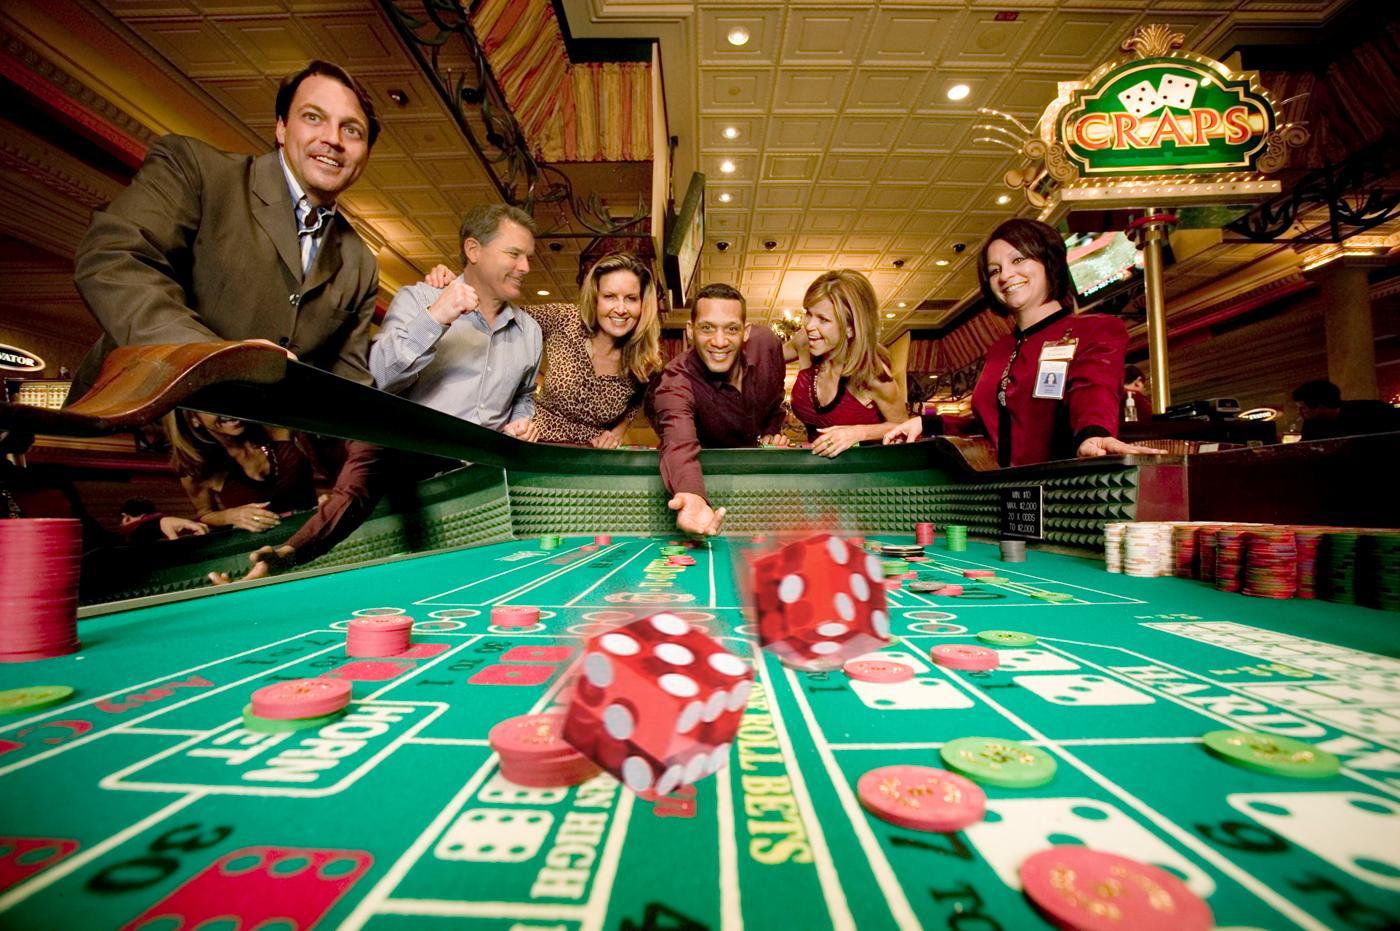 Jeux casino : opter pour les applications mobiles